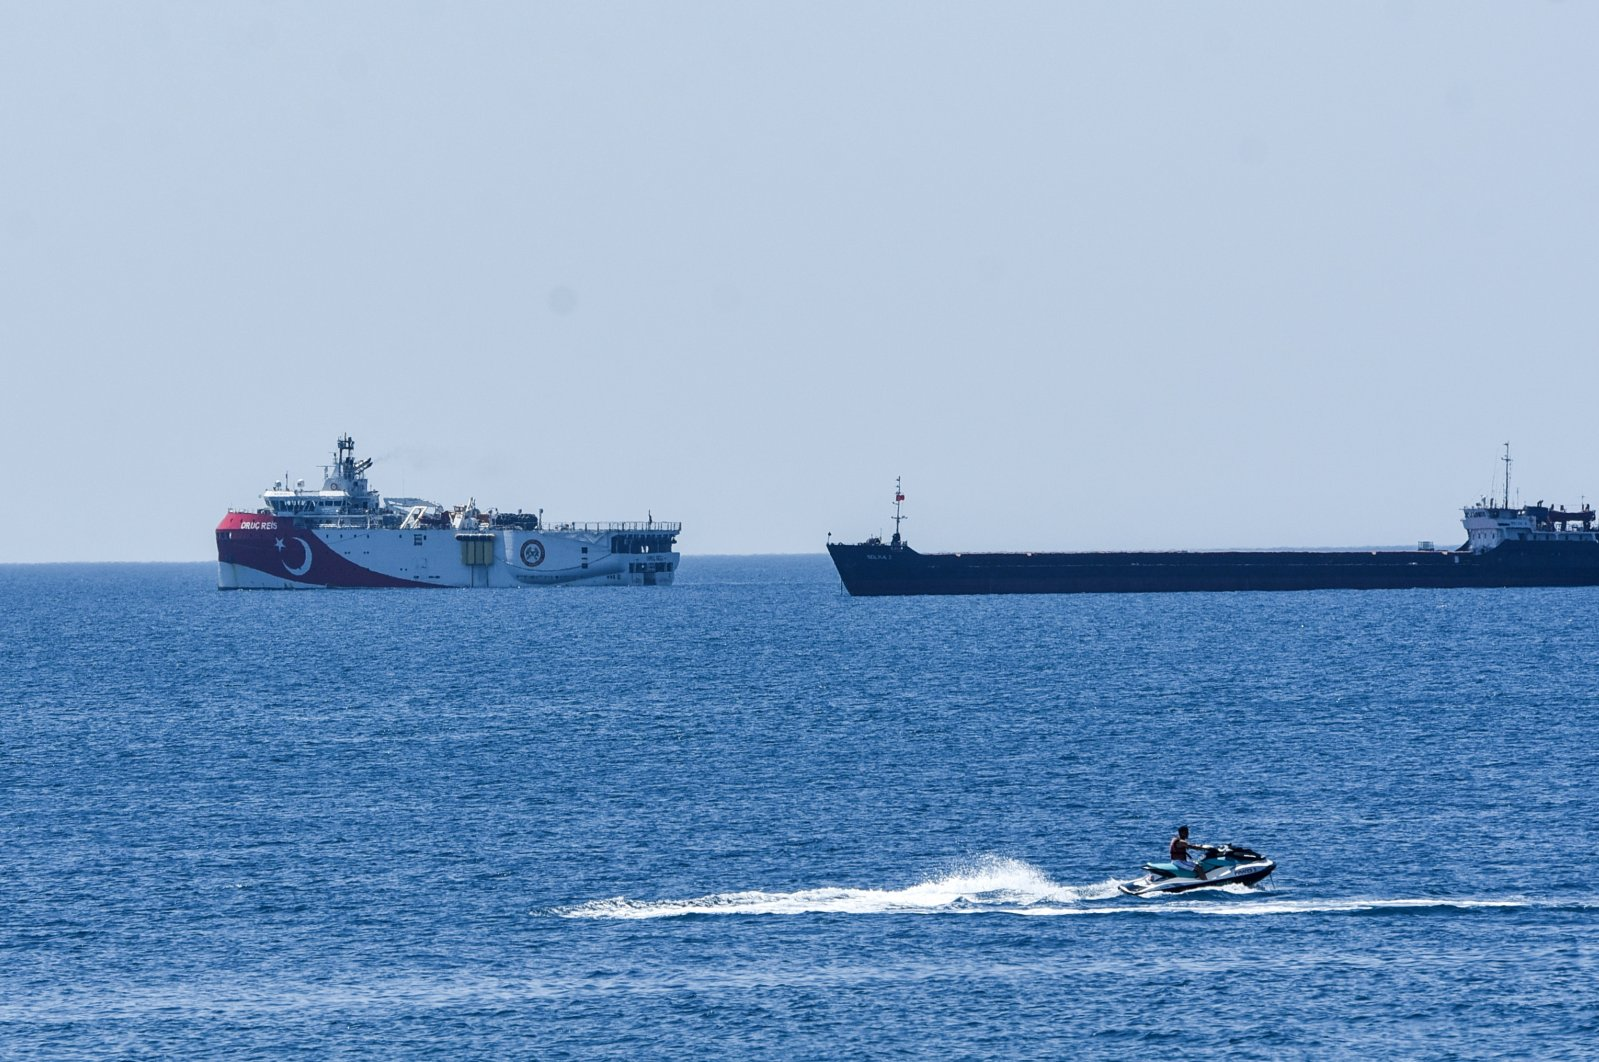 Turkey's seismic exploration vessel Oruç Reis is escorted by a Turkish Navy frigate off the shore of Antalya, southwest Turkey, July 22, 2020. (DHA Photo)